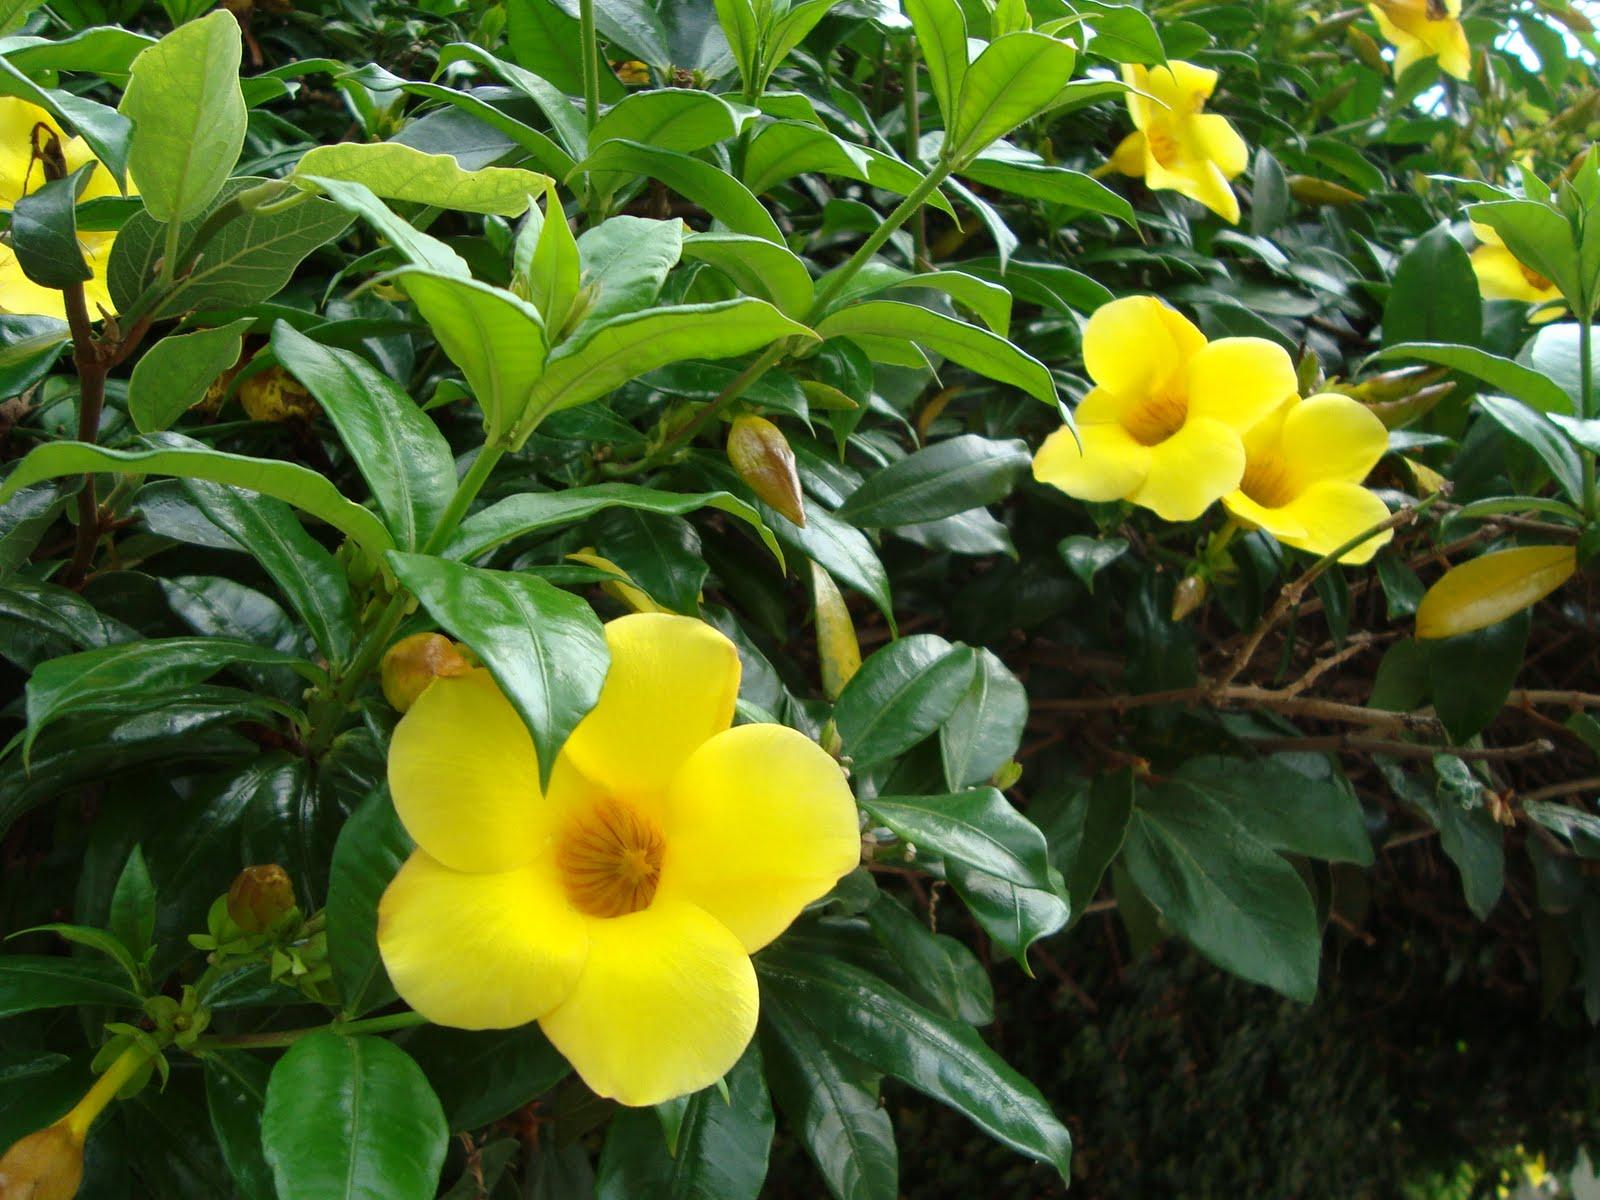 F nix plantas e jardins guia de trepadeiras alamanda for Plantas ornamentales tropicales